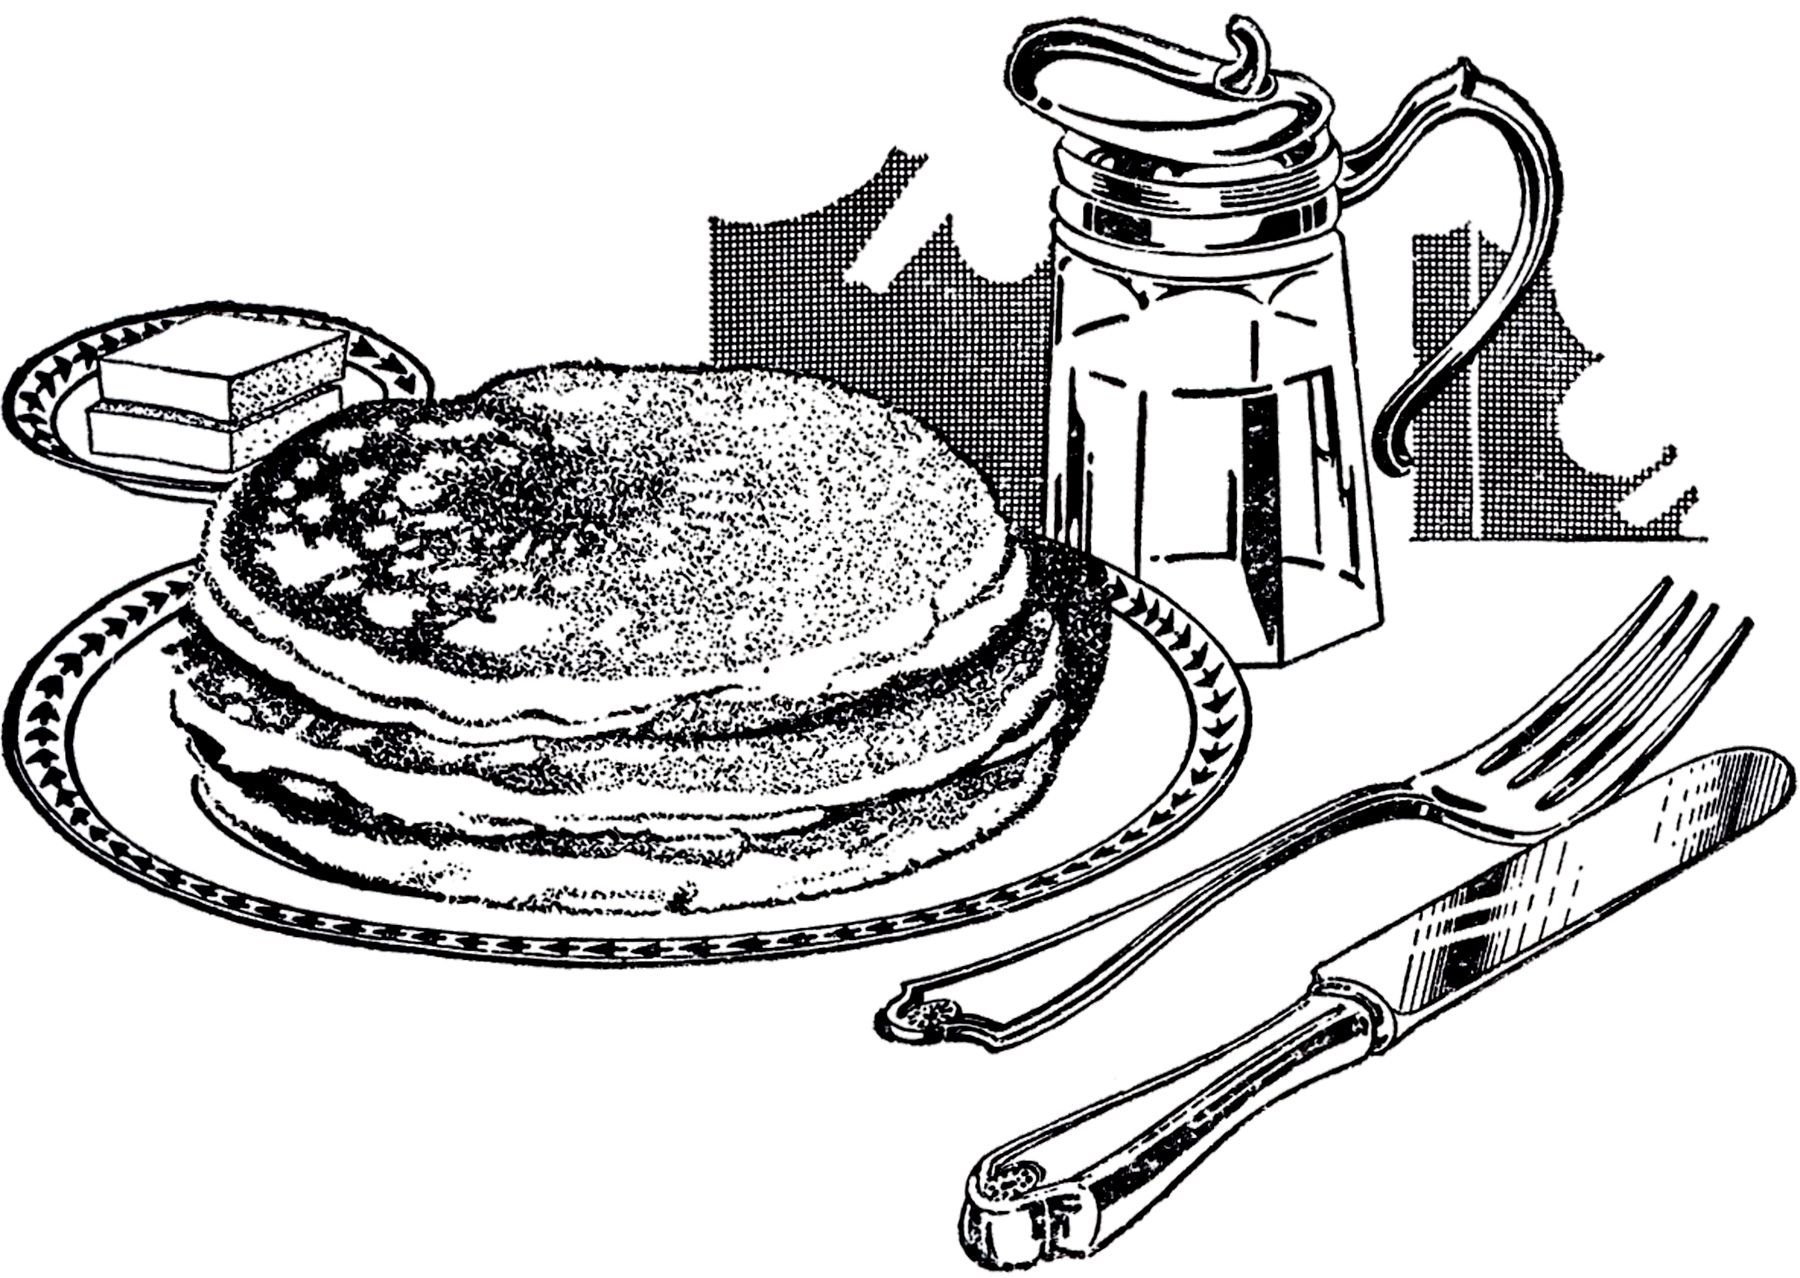 thegraphicsfairy com wp content uploads 2015 04 vintage pancake breakfast image [ 1800 x 1278 Pixel ]